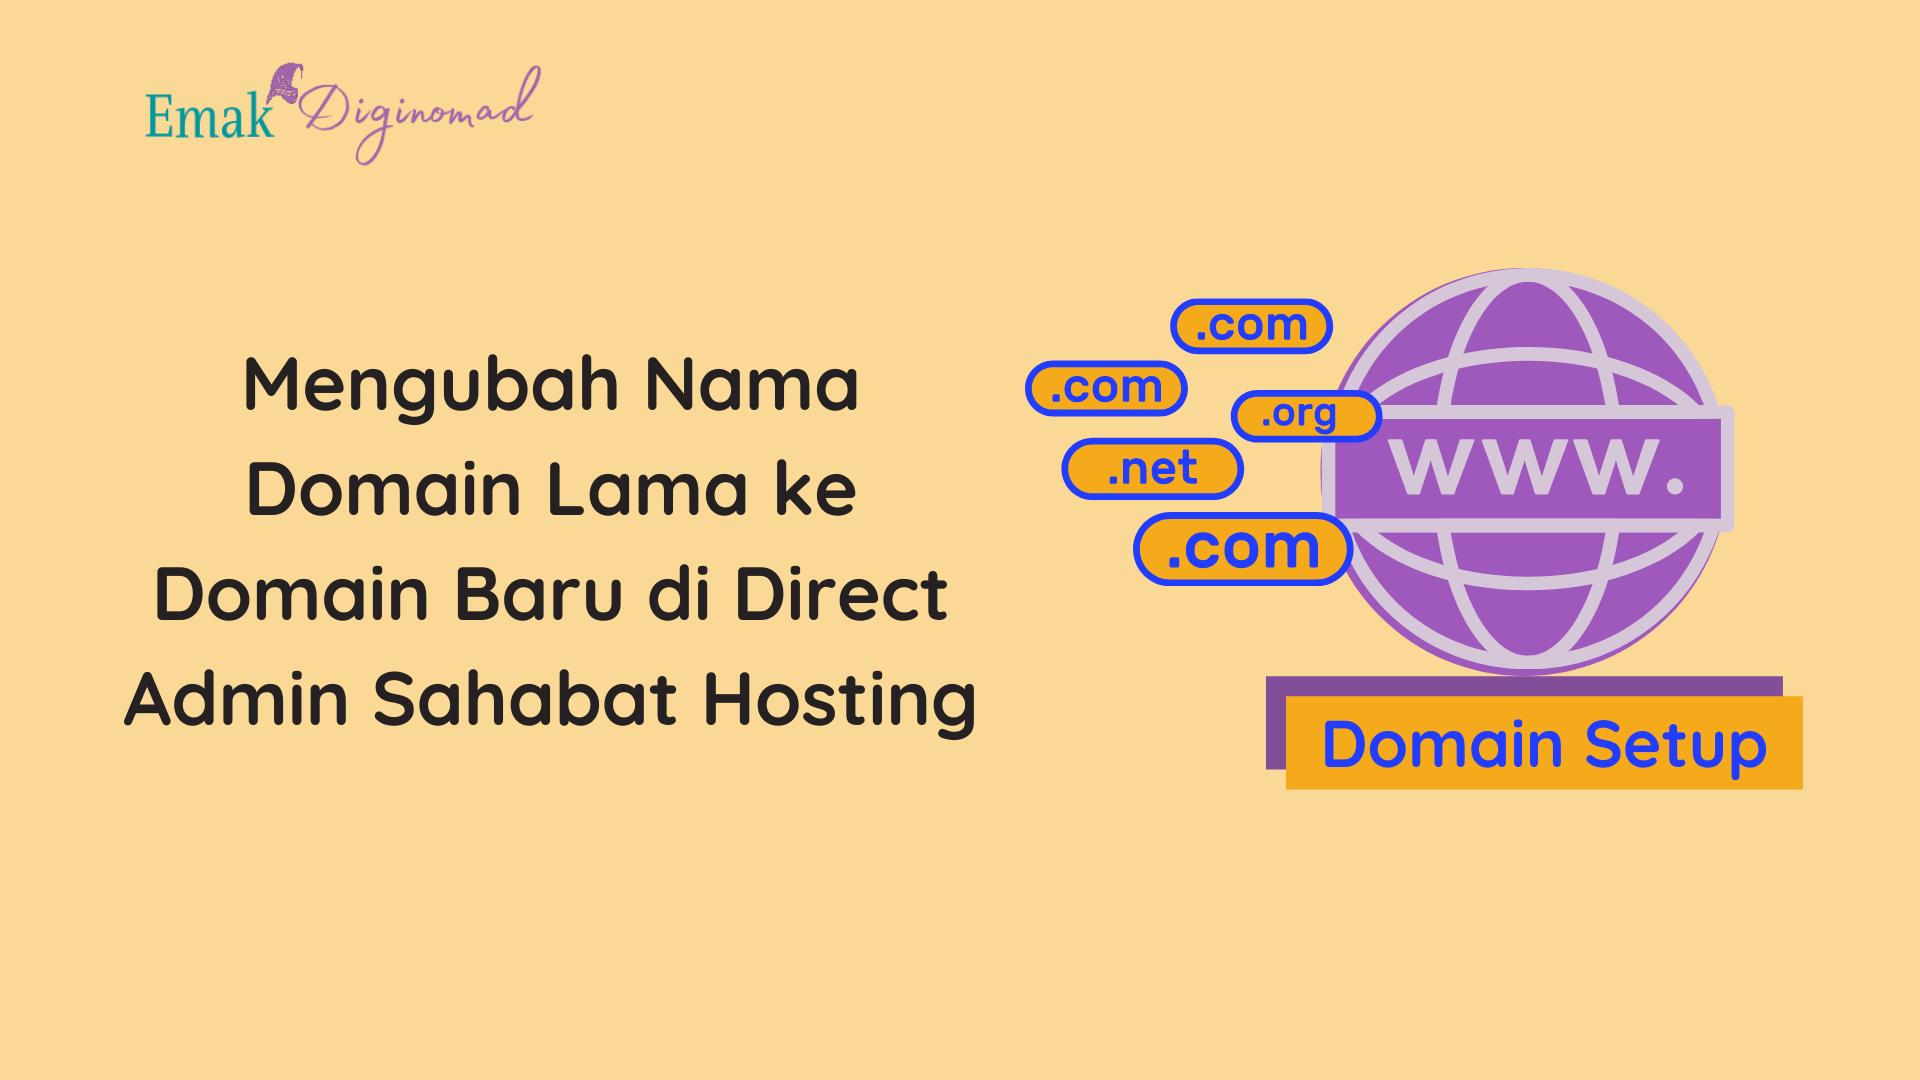 Mengubah domain lama ke domain terbaru